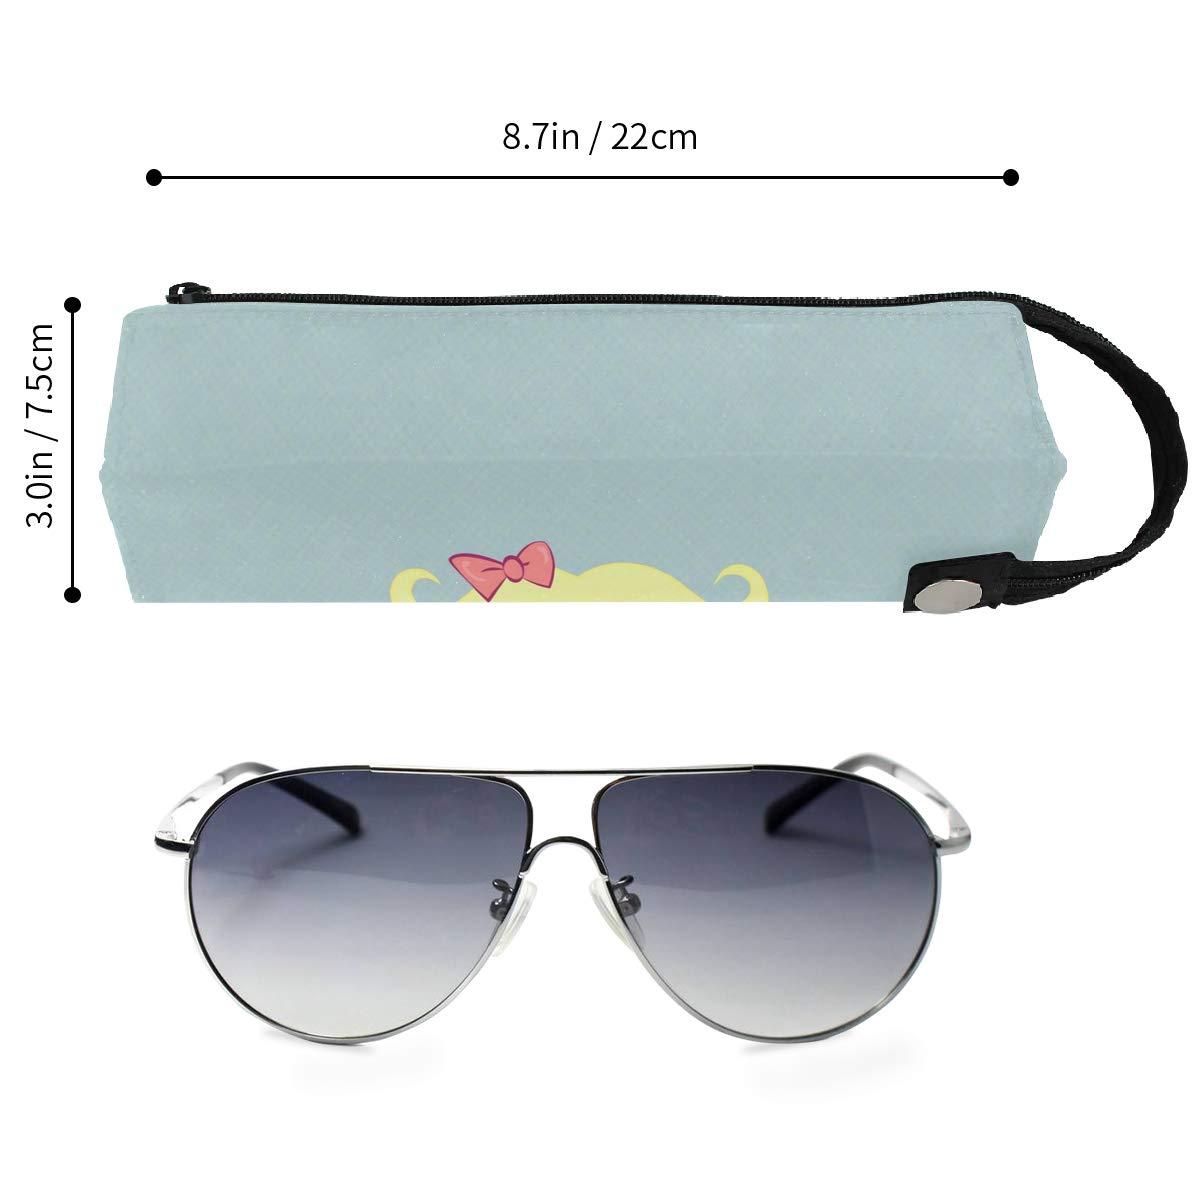 Glasses Case Full HD Wallpaper Travel Soft Sunglasses Pencil Bag Protective Box